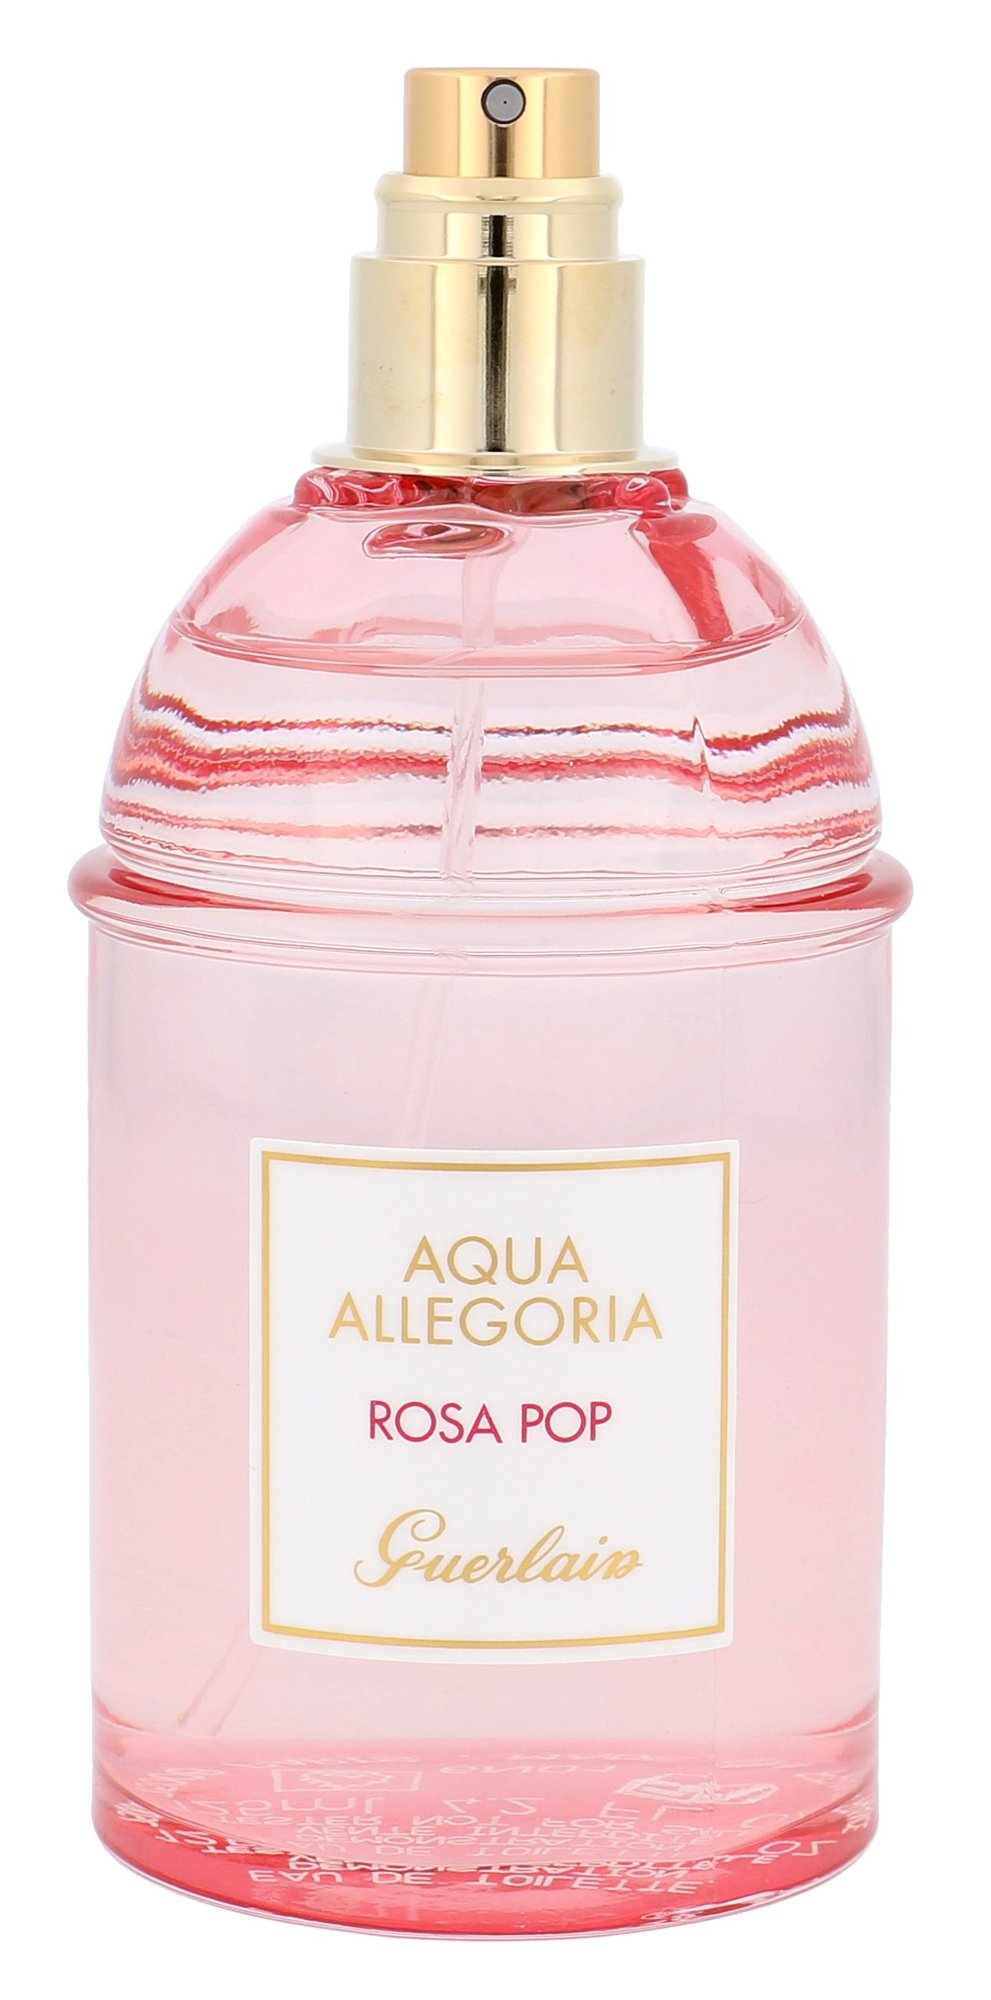 Guerlain Aqua Allegoria Rosa Pop EDT 125ml